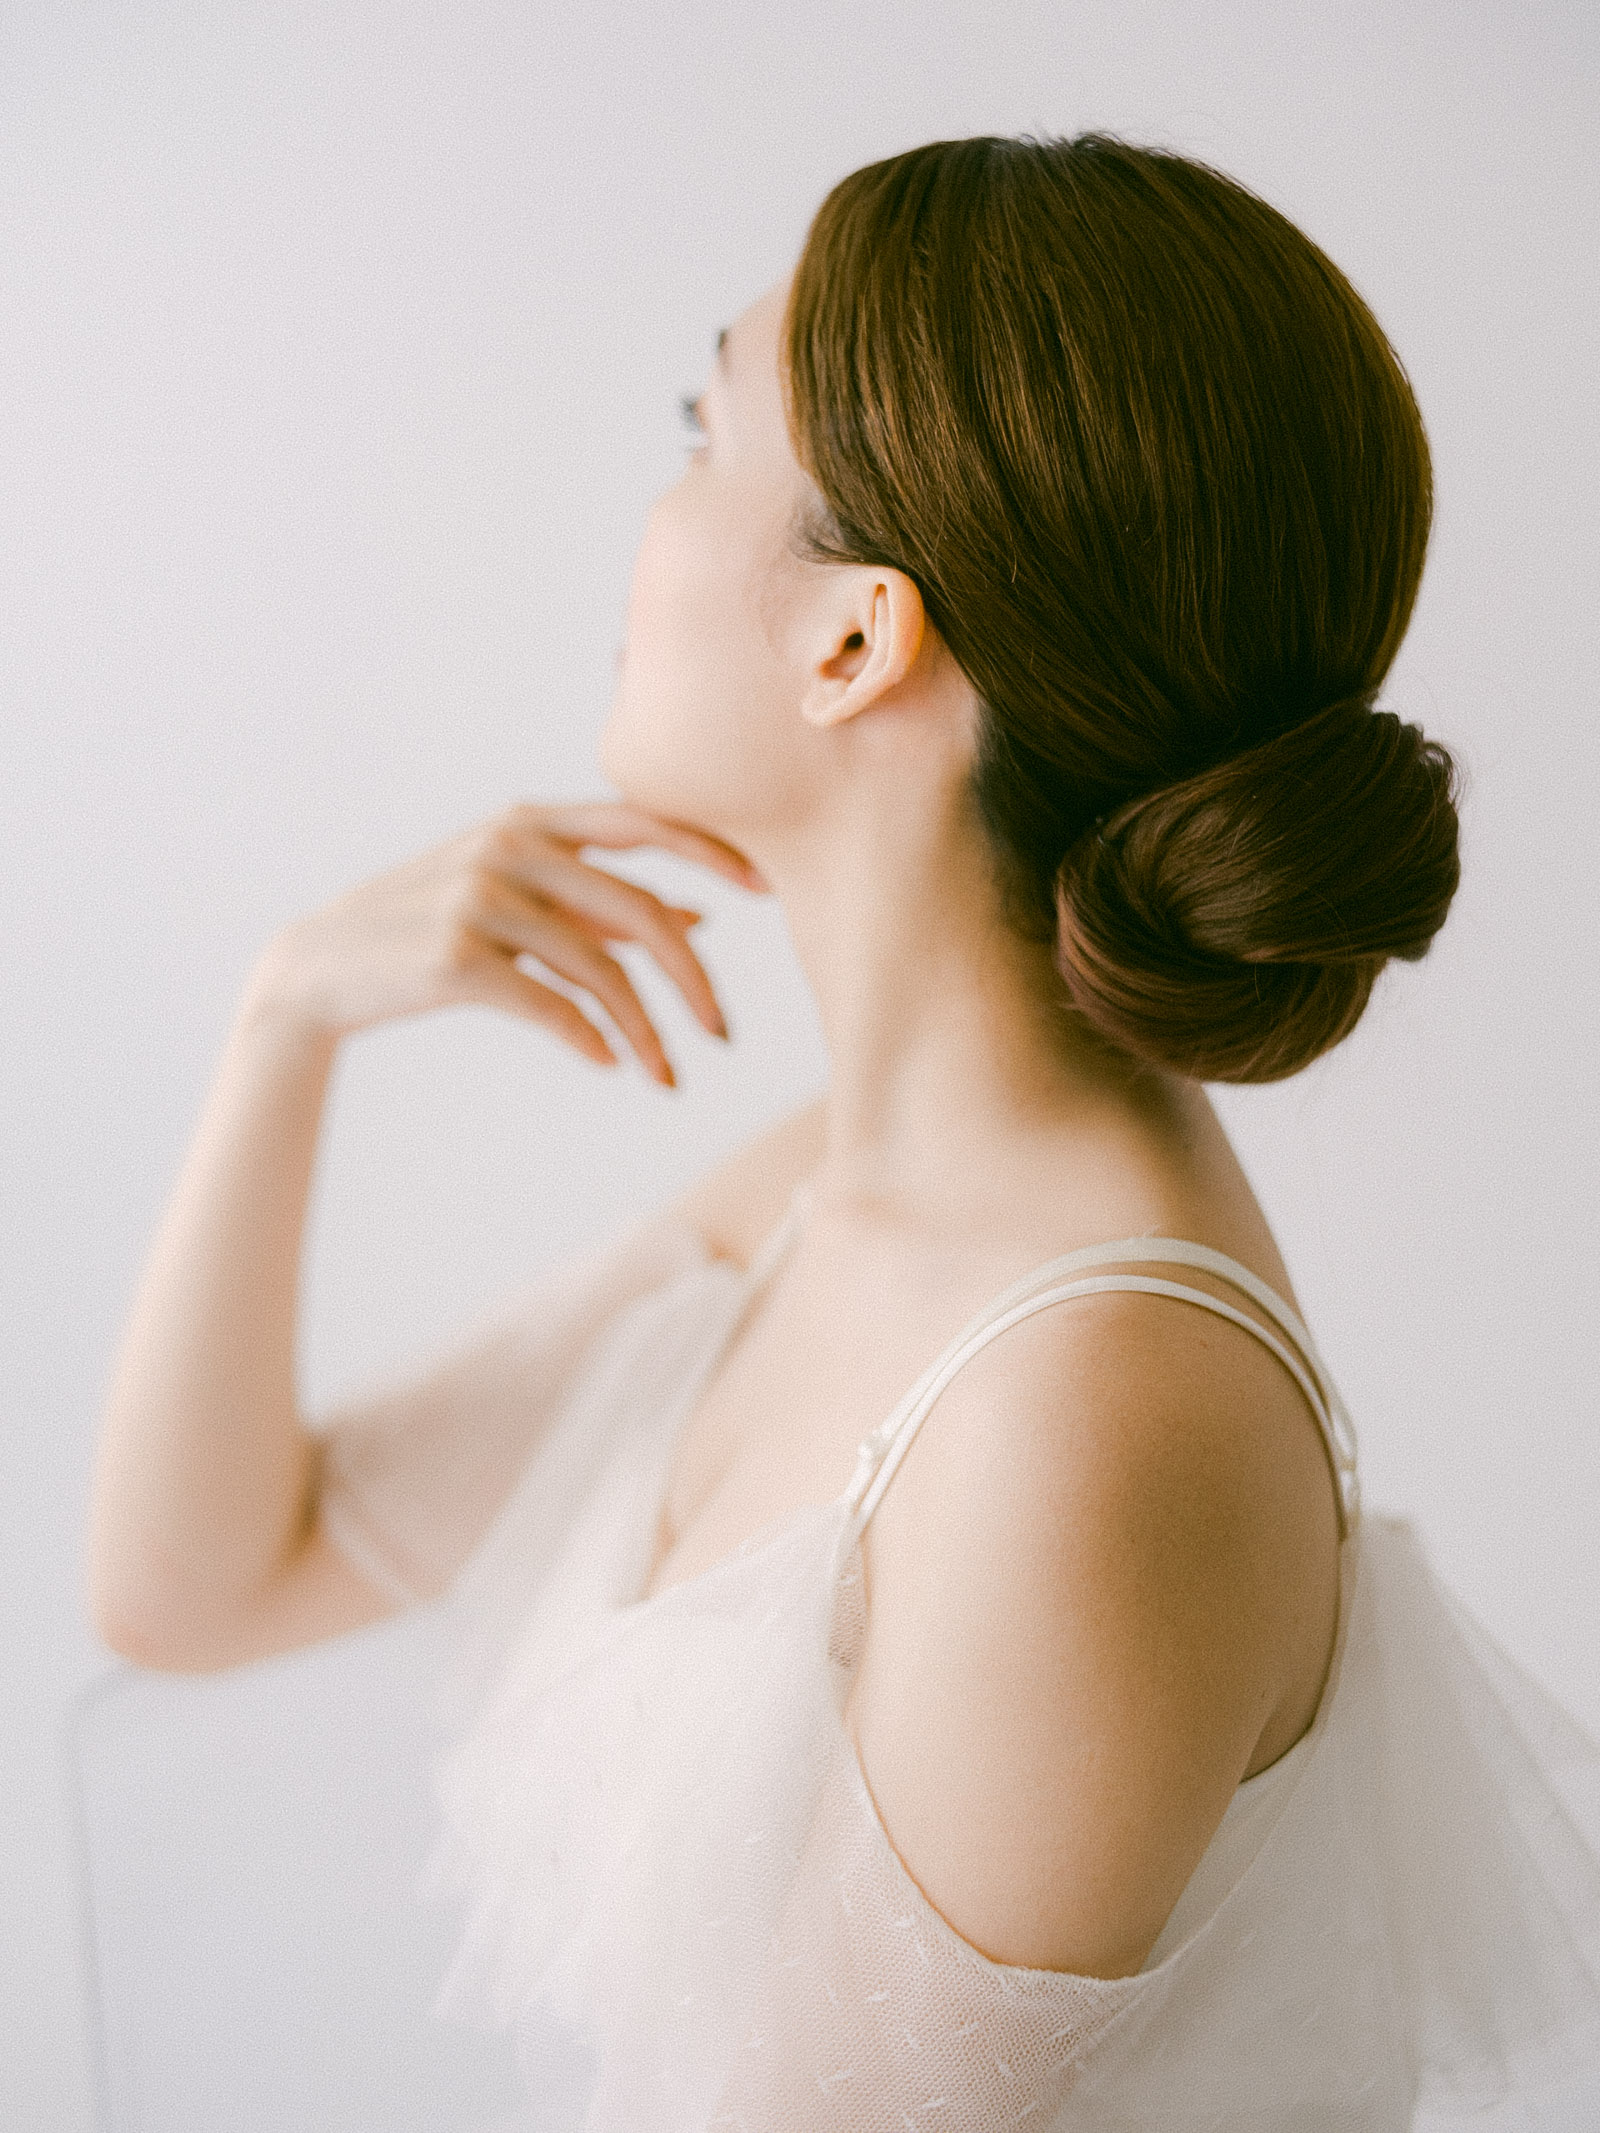 Jill Loves Lace 2021 古董婚紗 底片 古董婚紗 Fine Art Fuji GFX 50R